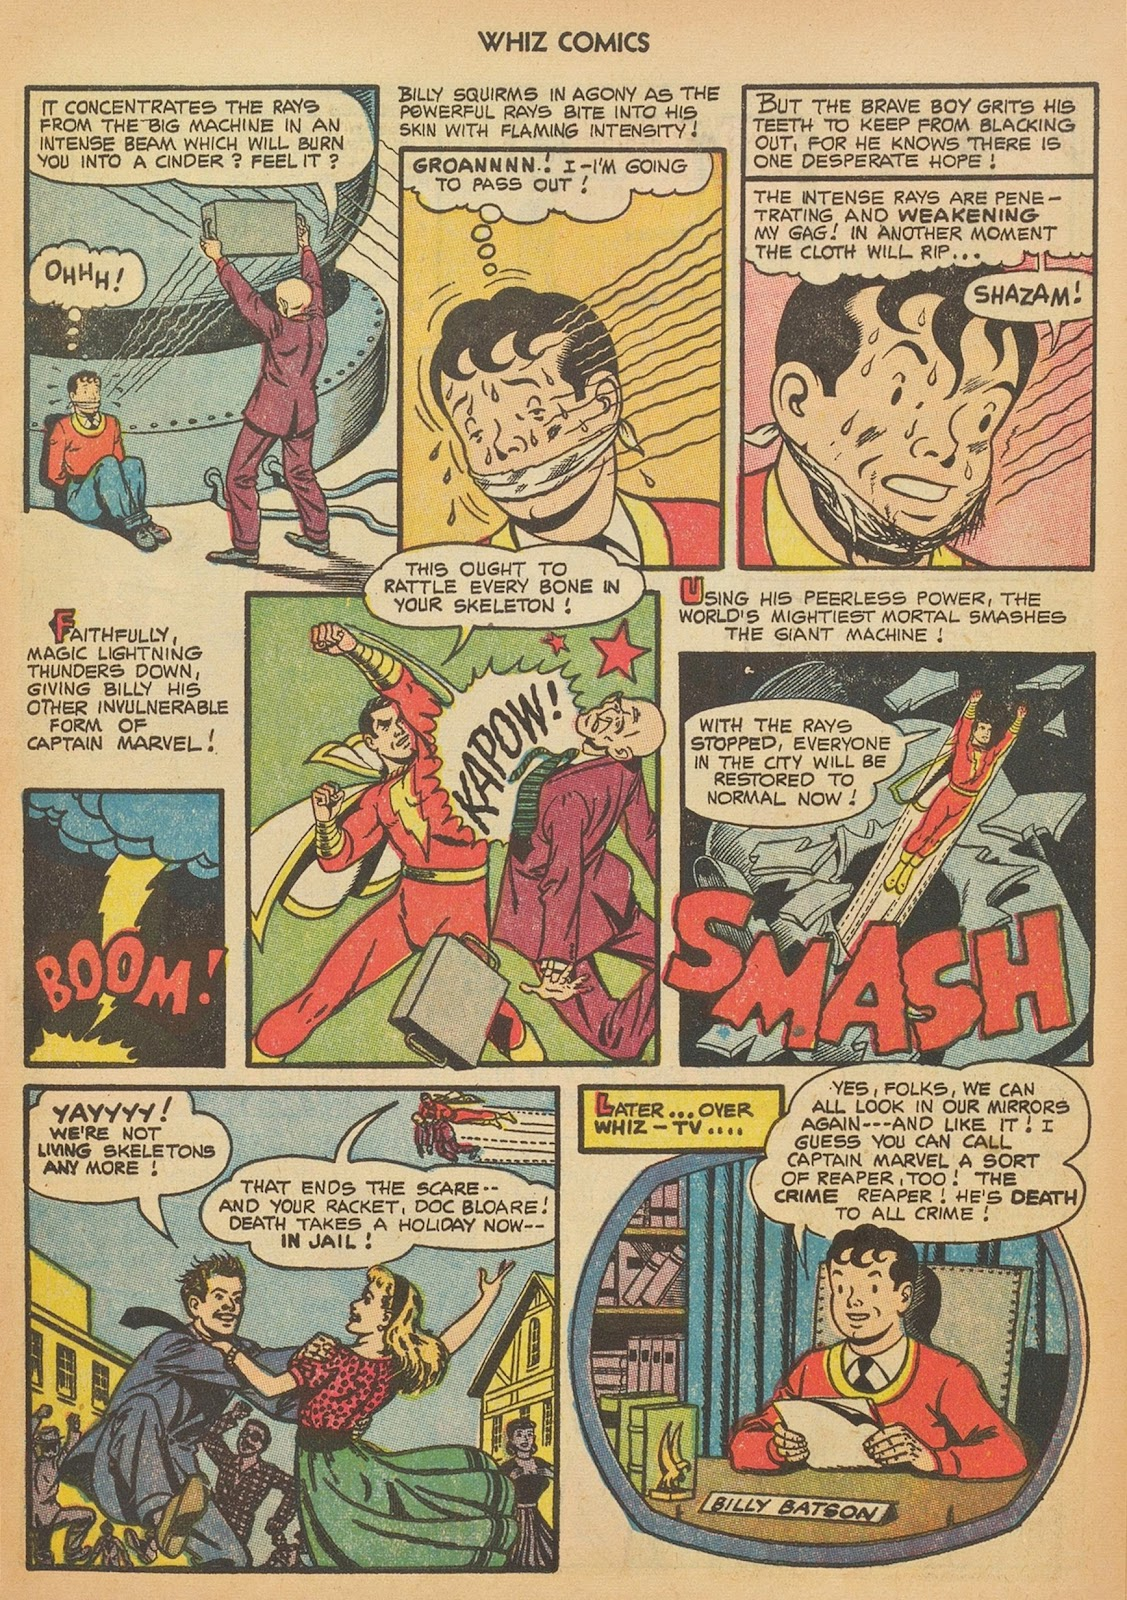 Read online WHIZ Comics comic -  Issue #153 - 9